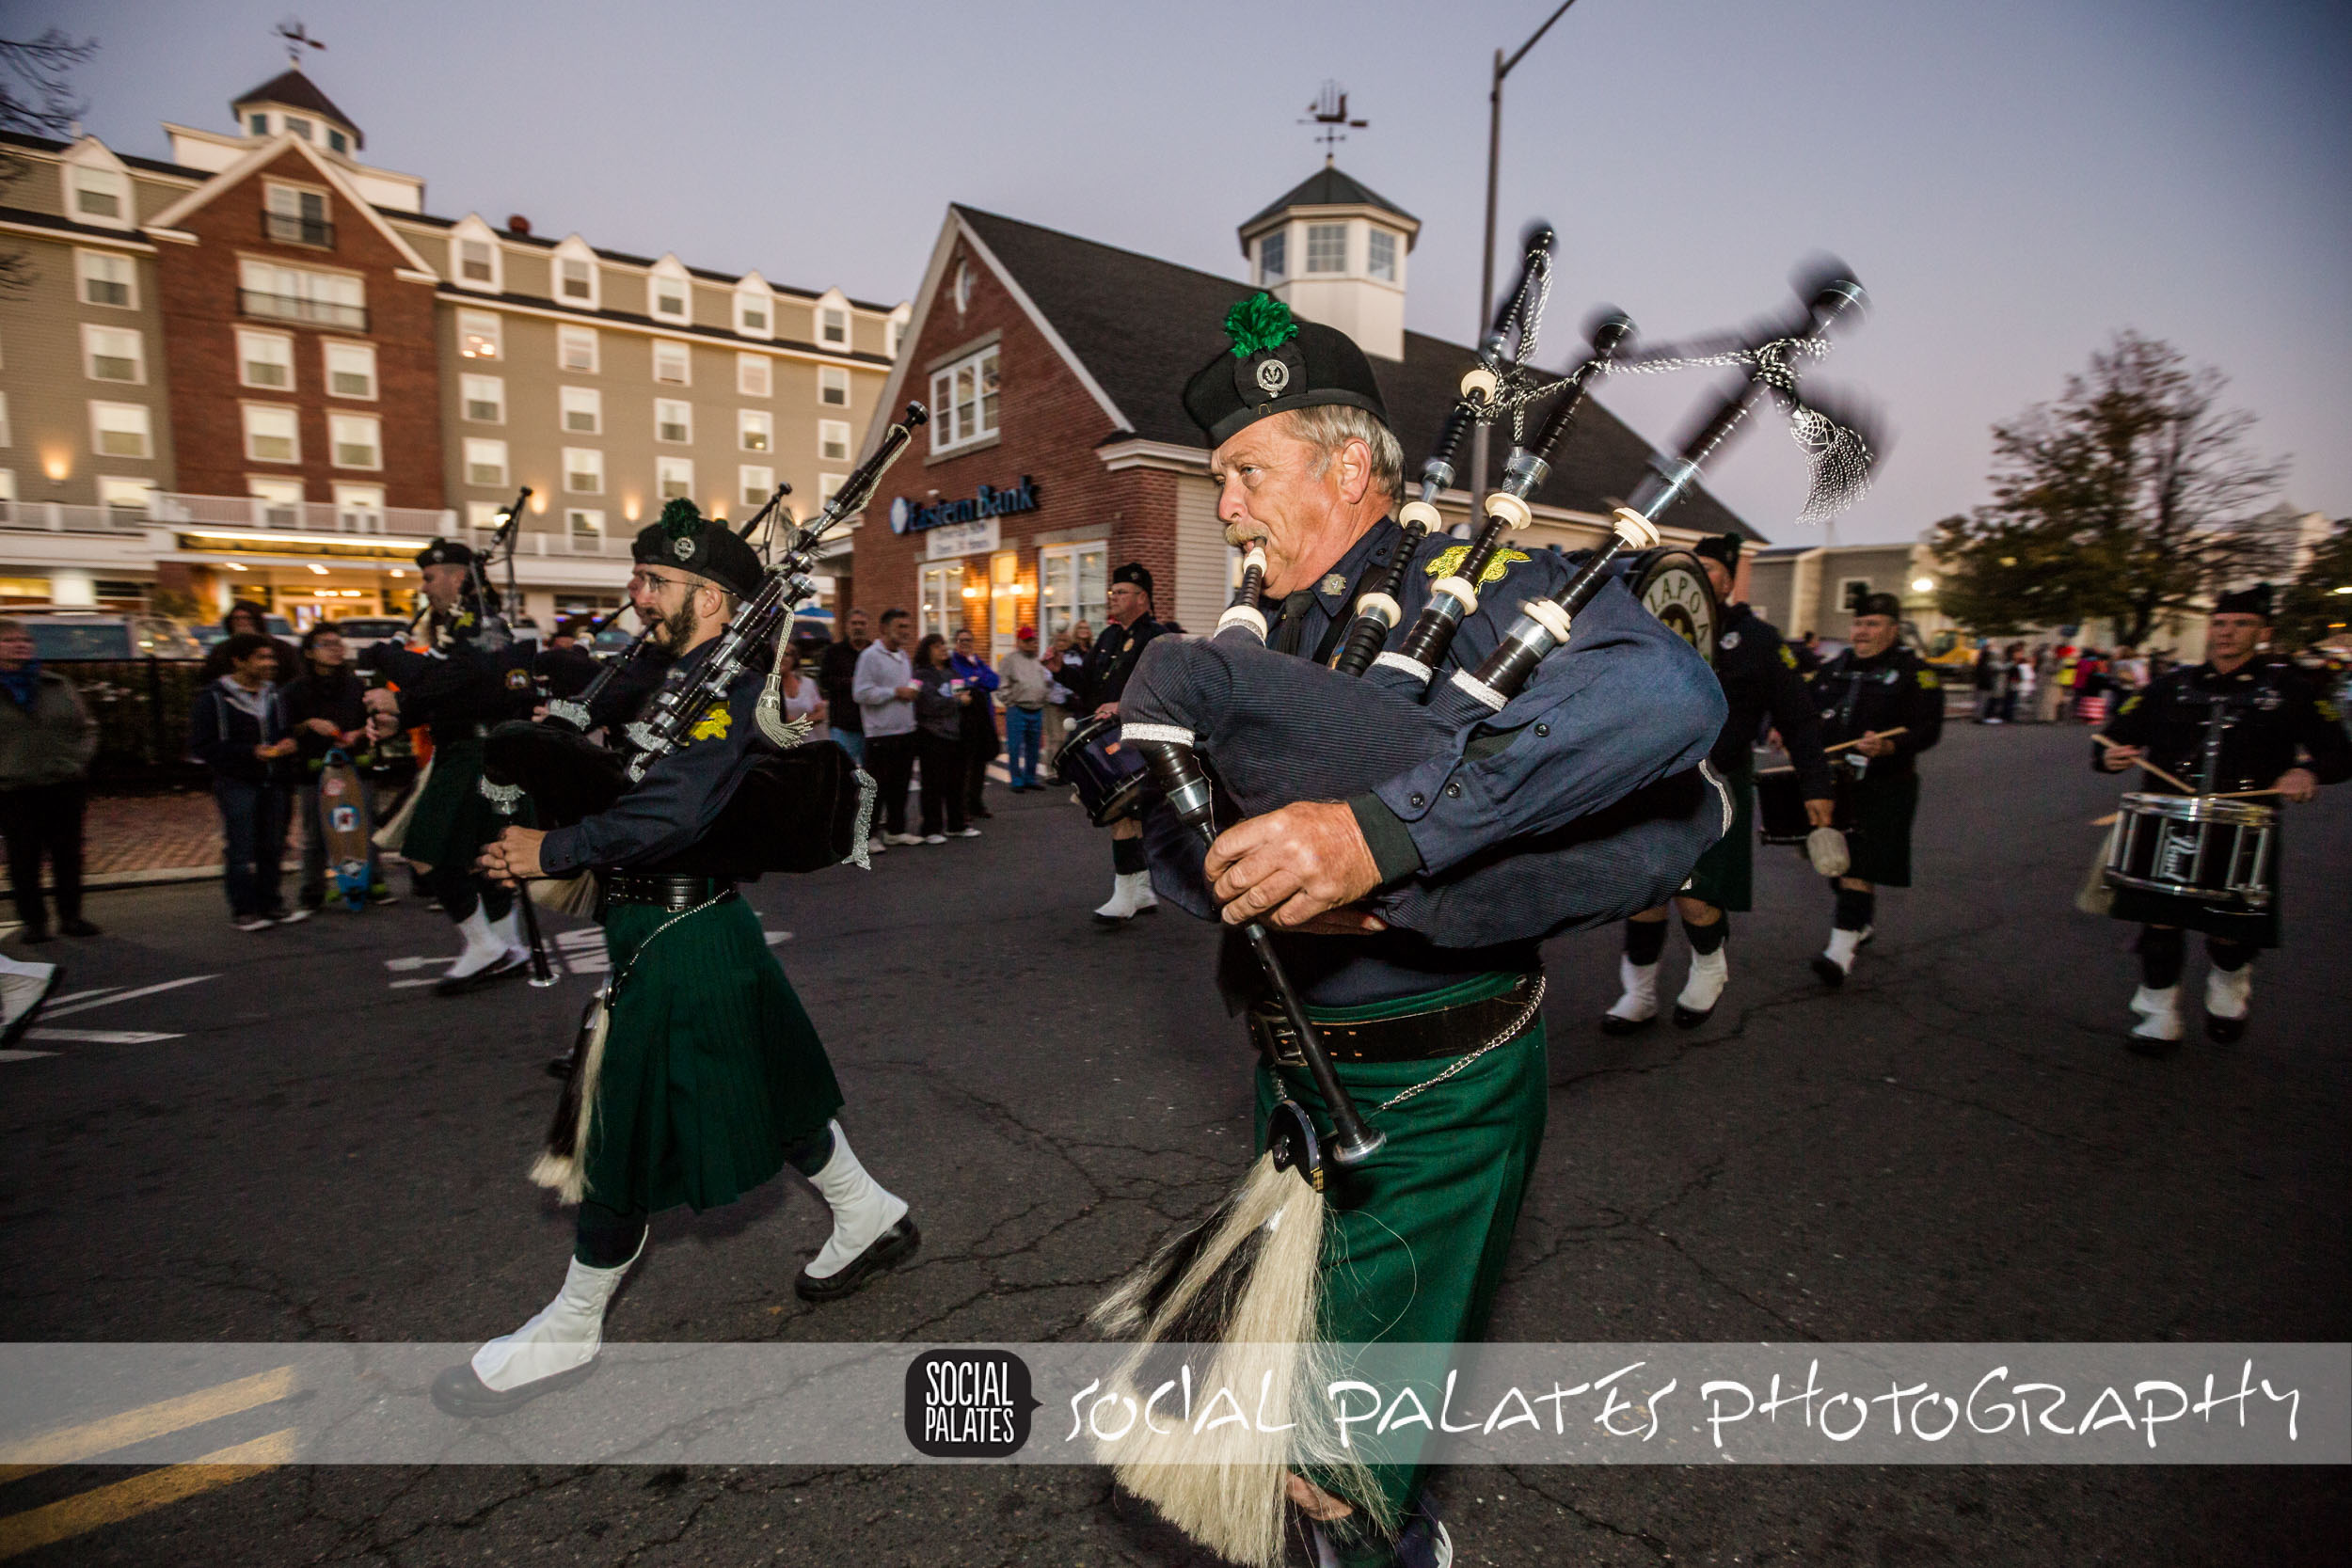 Haunted Happenings Parade 2014 Creative Salem by Social Palates-7339.jpg